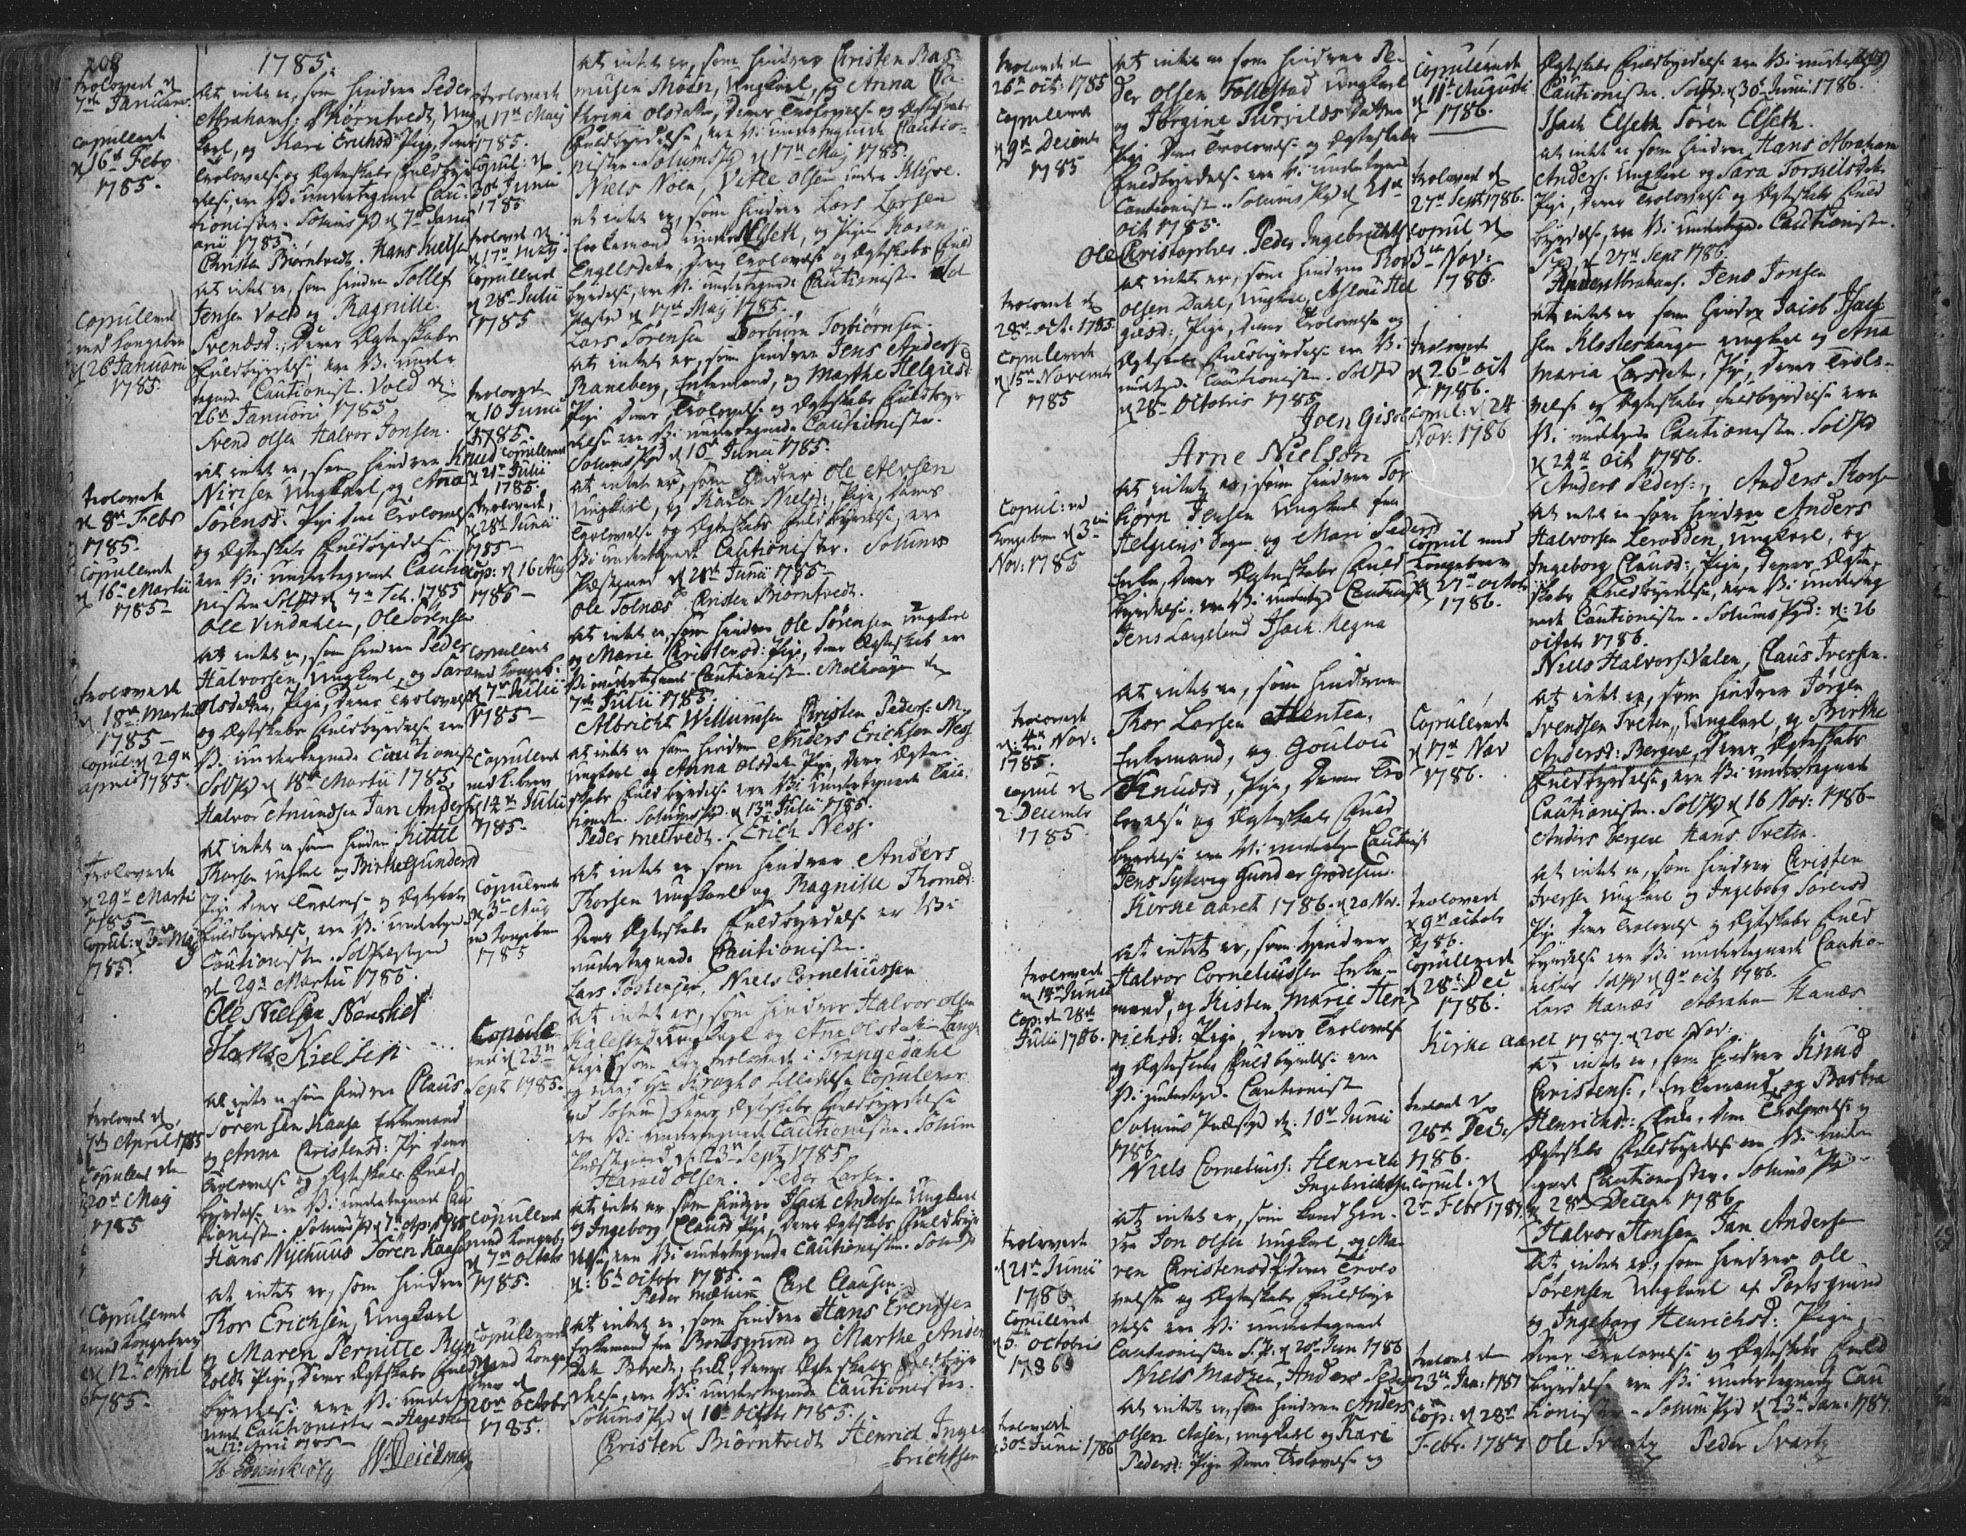 SAKO, Solum kirkebøker, F/Fa/L0003: Ministerialbok nr. I 3, 1761-1814, s. 208-209